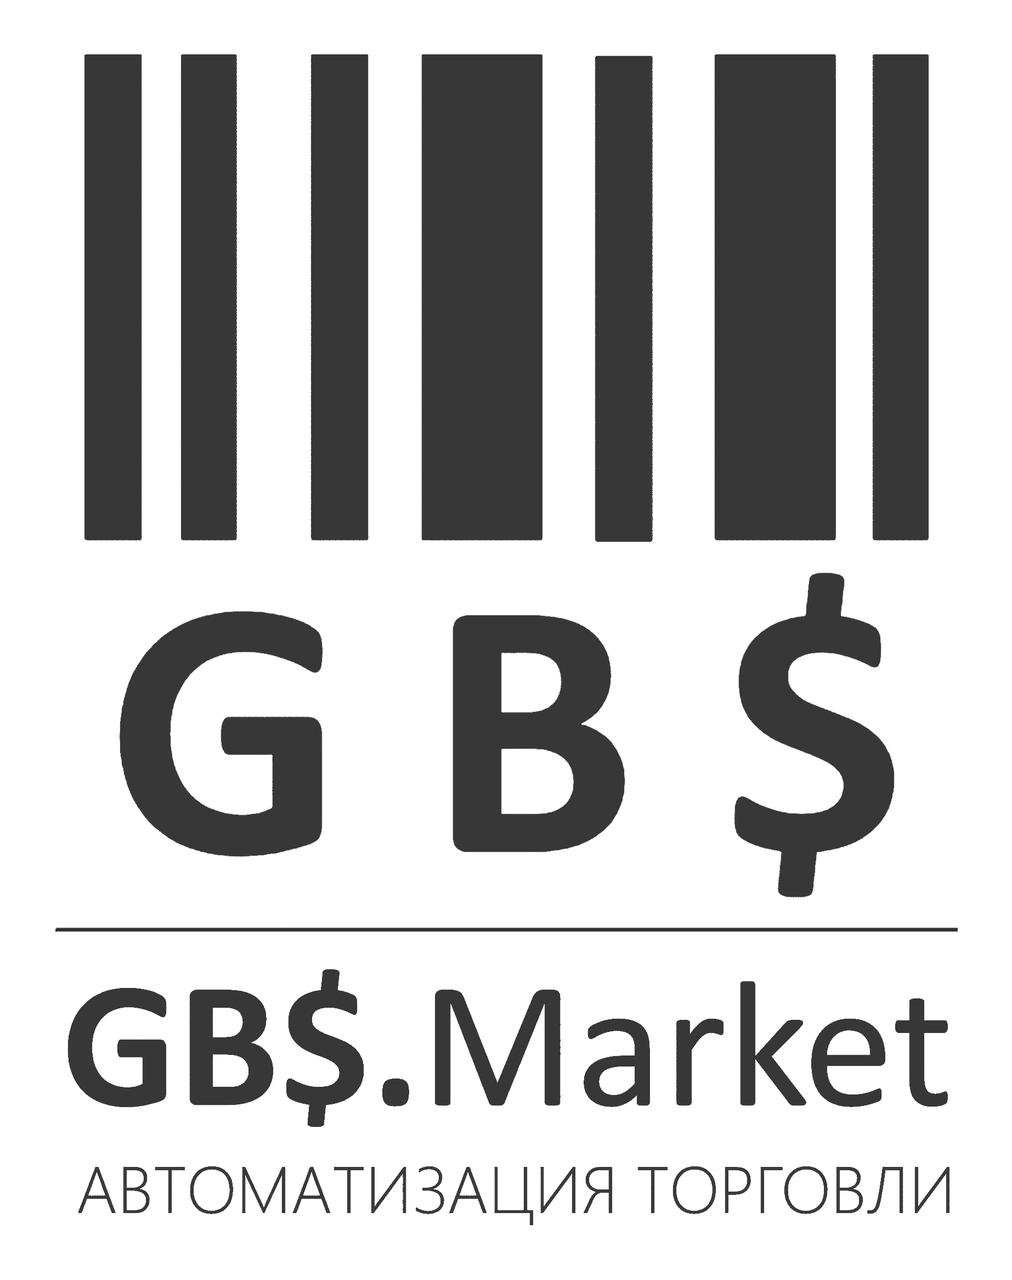 Автоматизация магазина GBS.Market фото